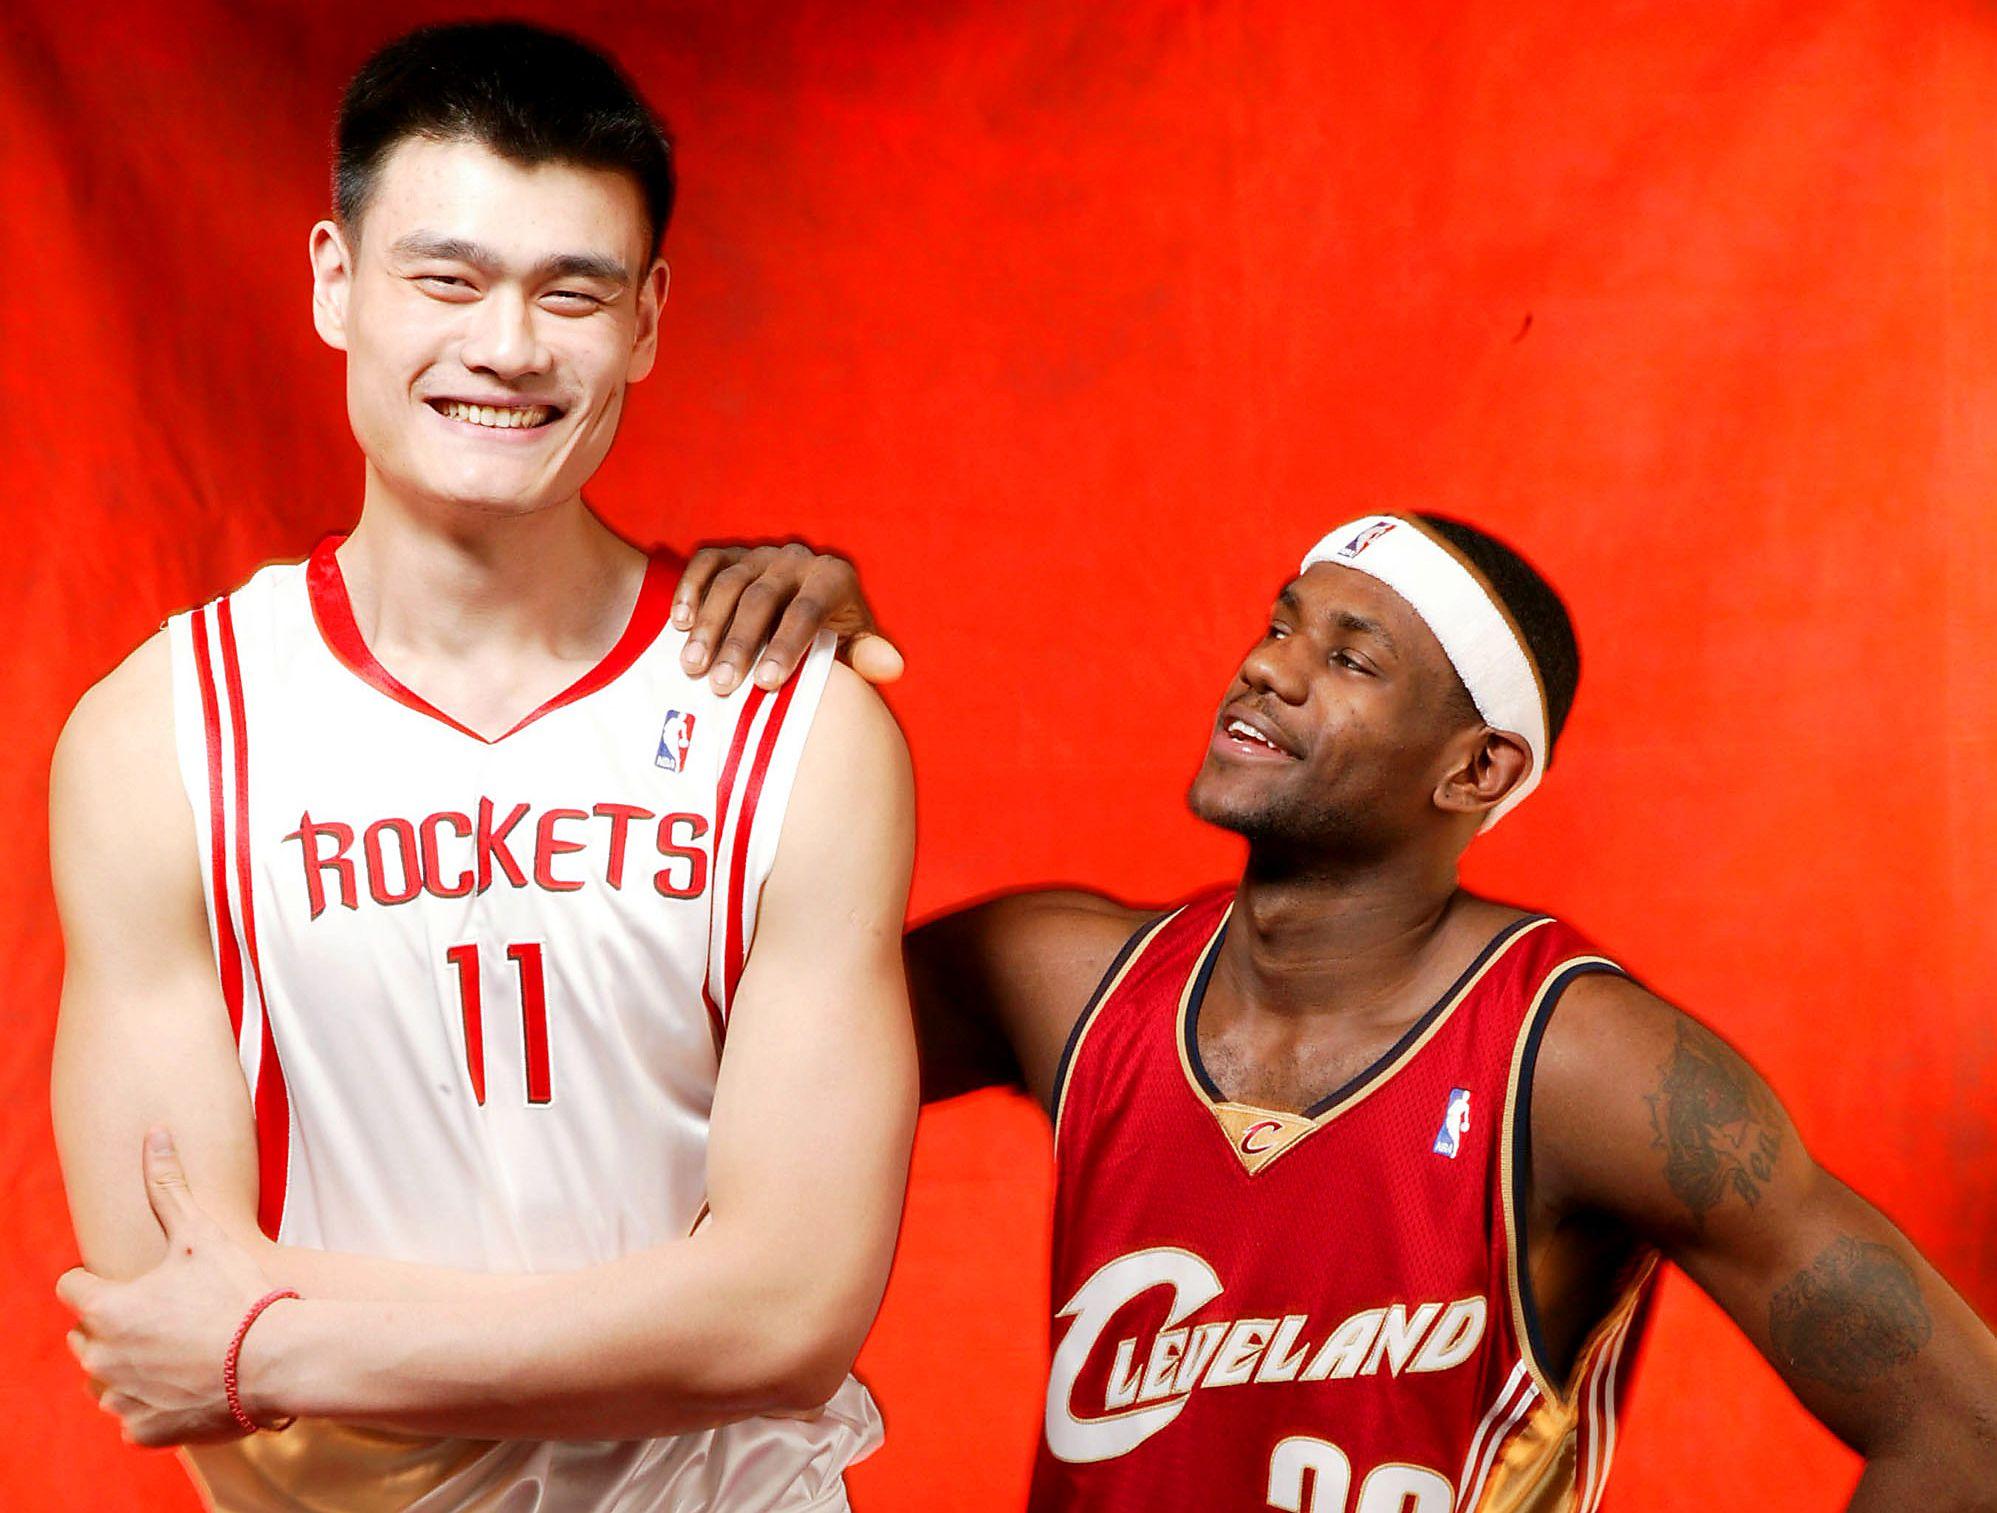 Yao Ming, LeBron James - Yao Ming: A hall of fame photo ...